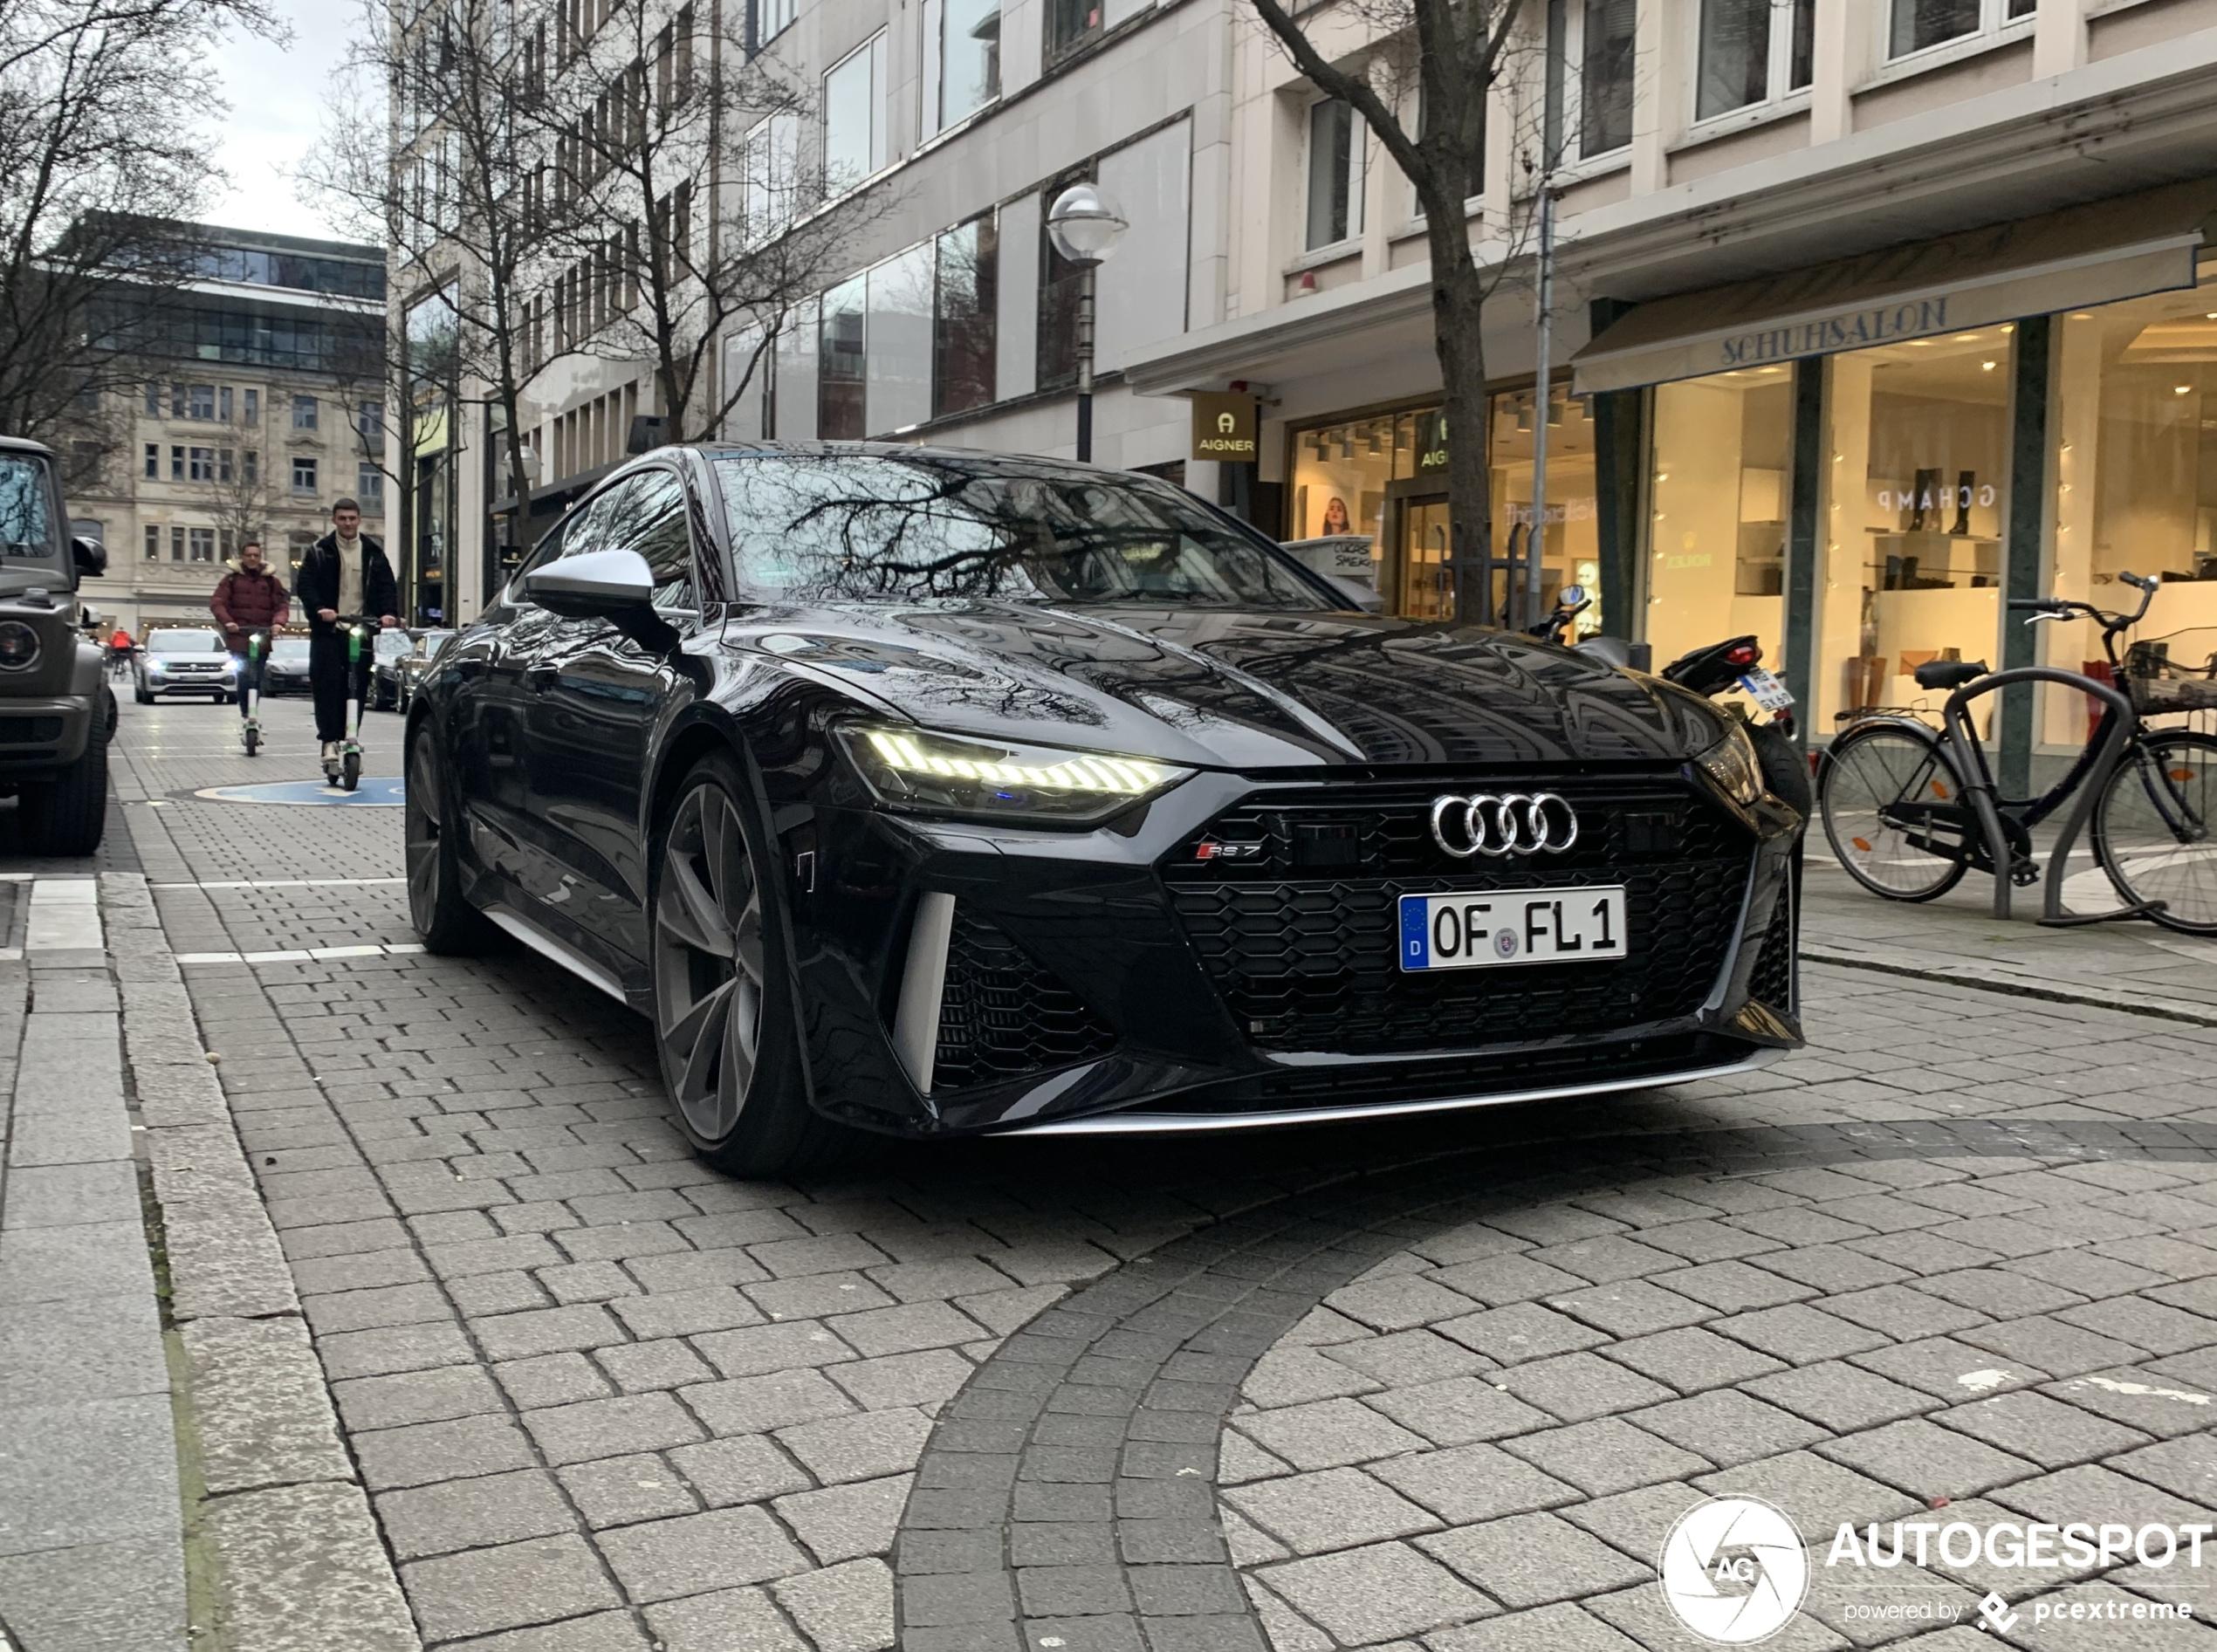 Audi Rs7 Sportback C8 11 Enero 2020 Autogespot